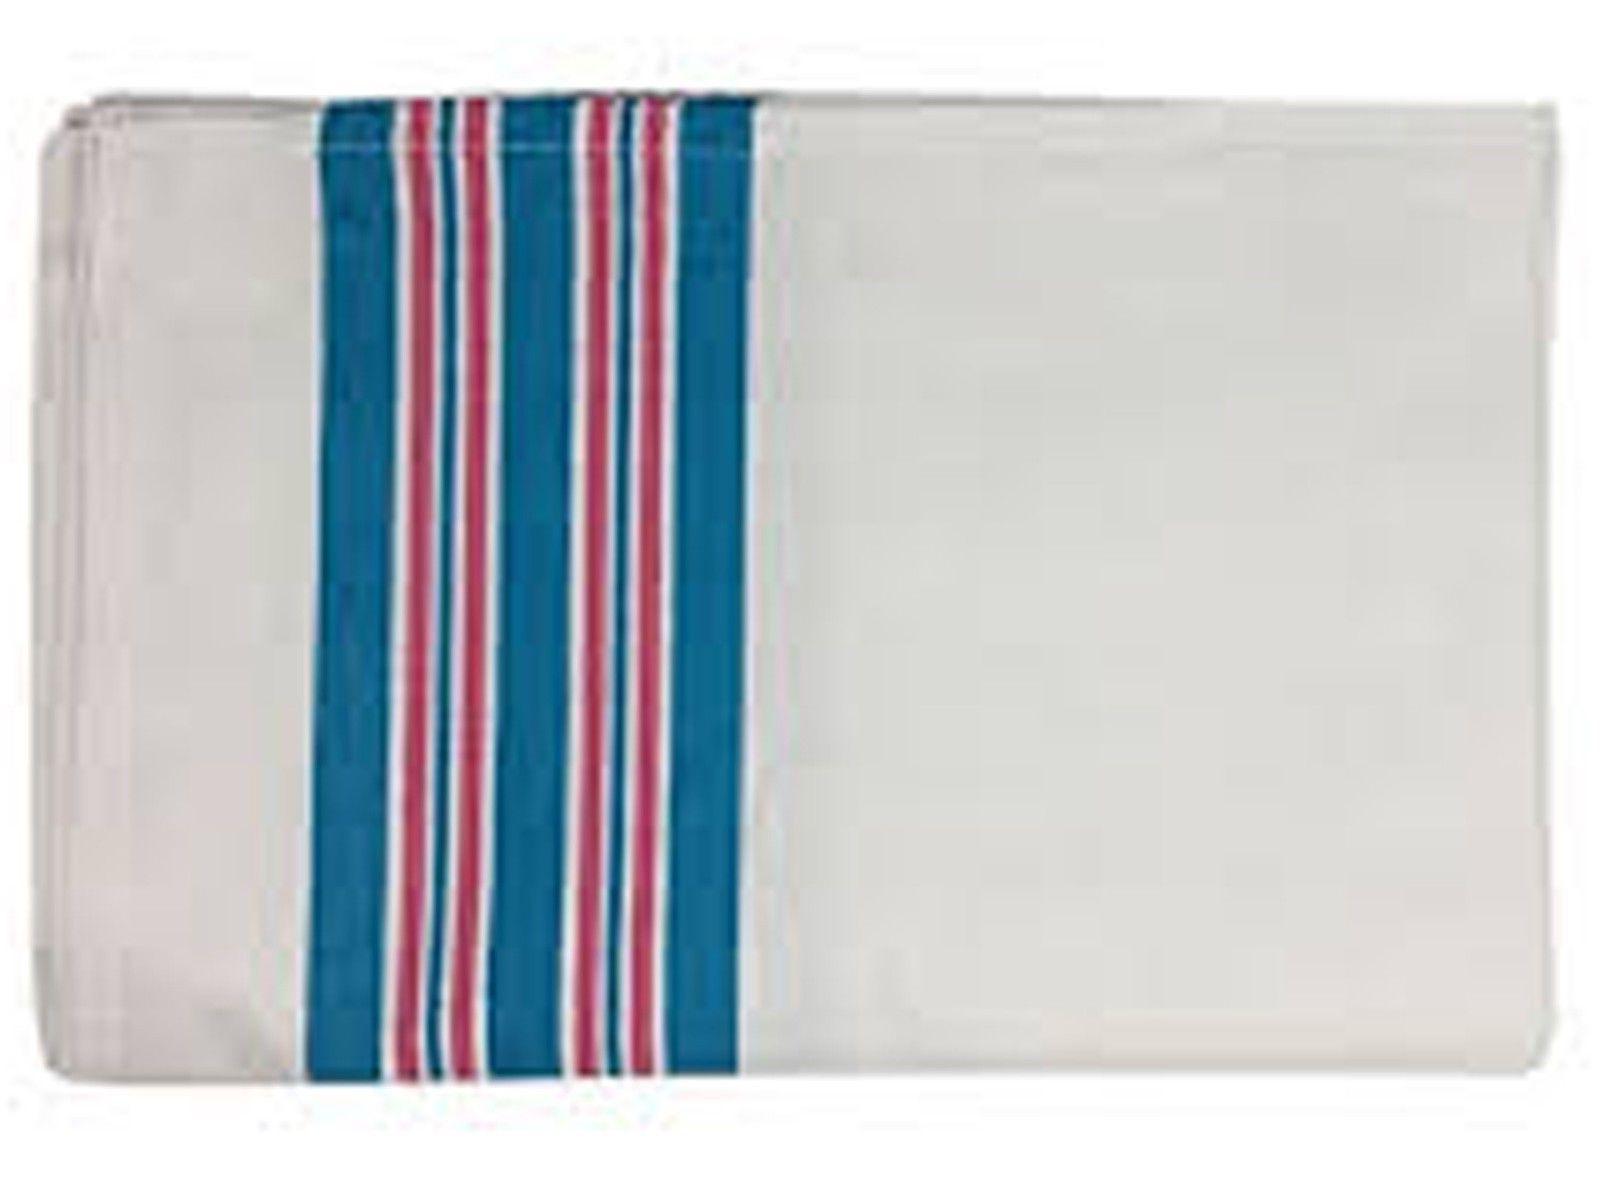 12 NEW Infant Hospital Blankets